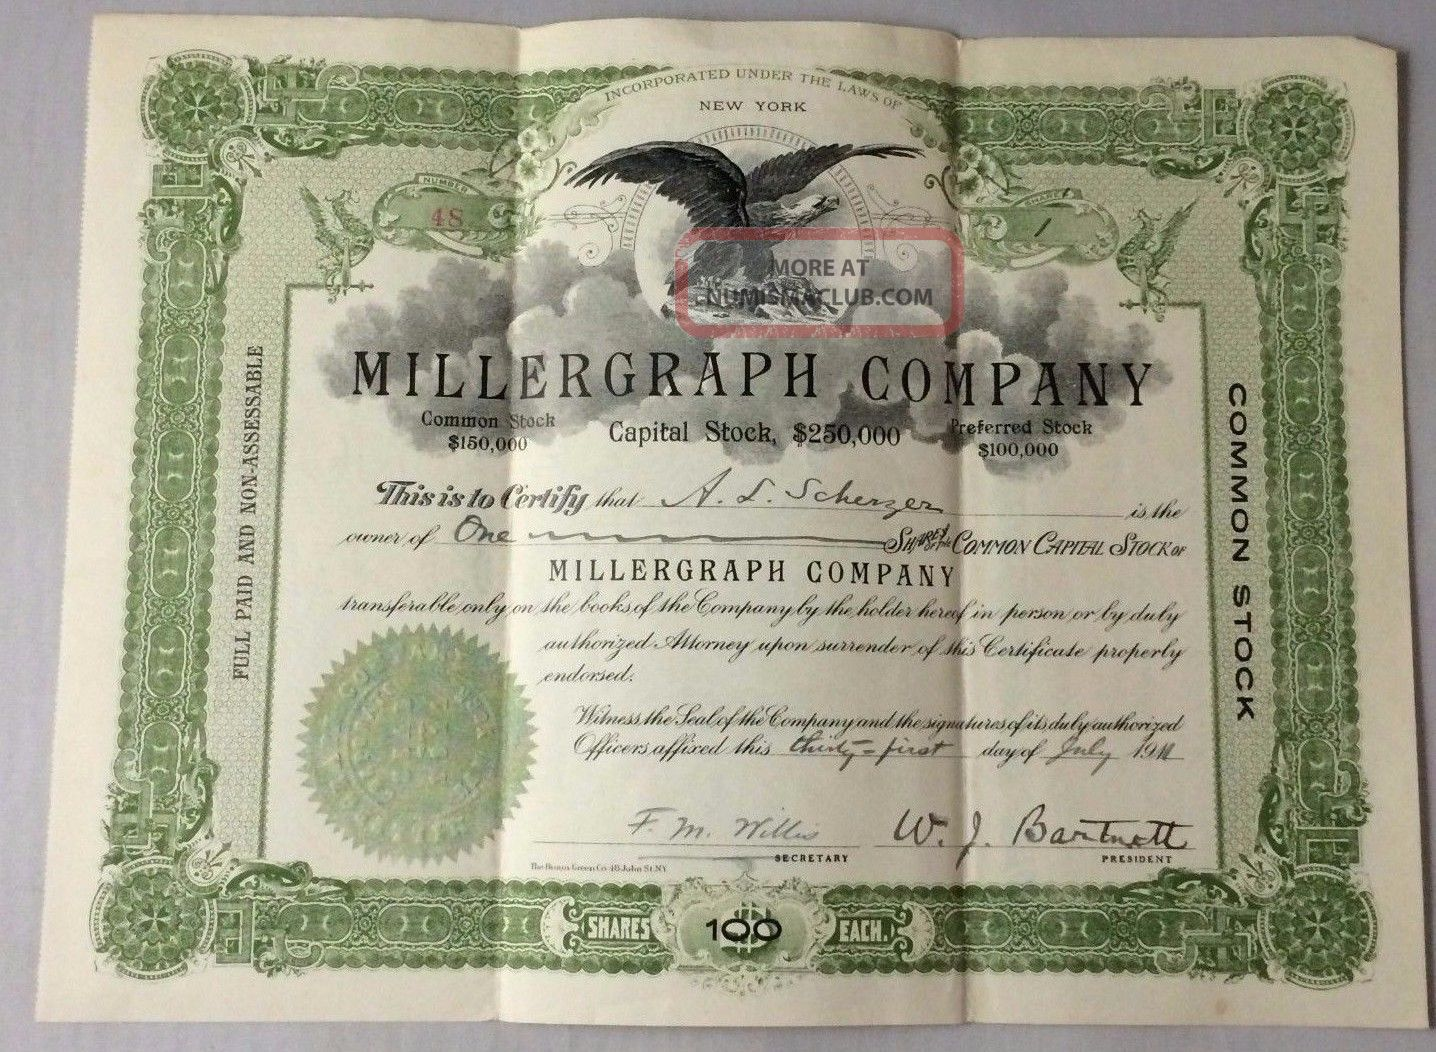 1911 Stock Certificate Millergraph Company A.  L.  Scherzer 100 Shares Stocks & Bonds, Scripophily photo